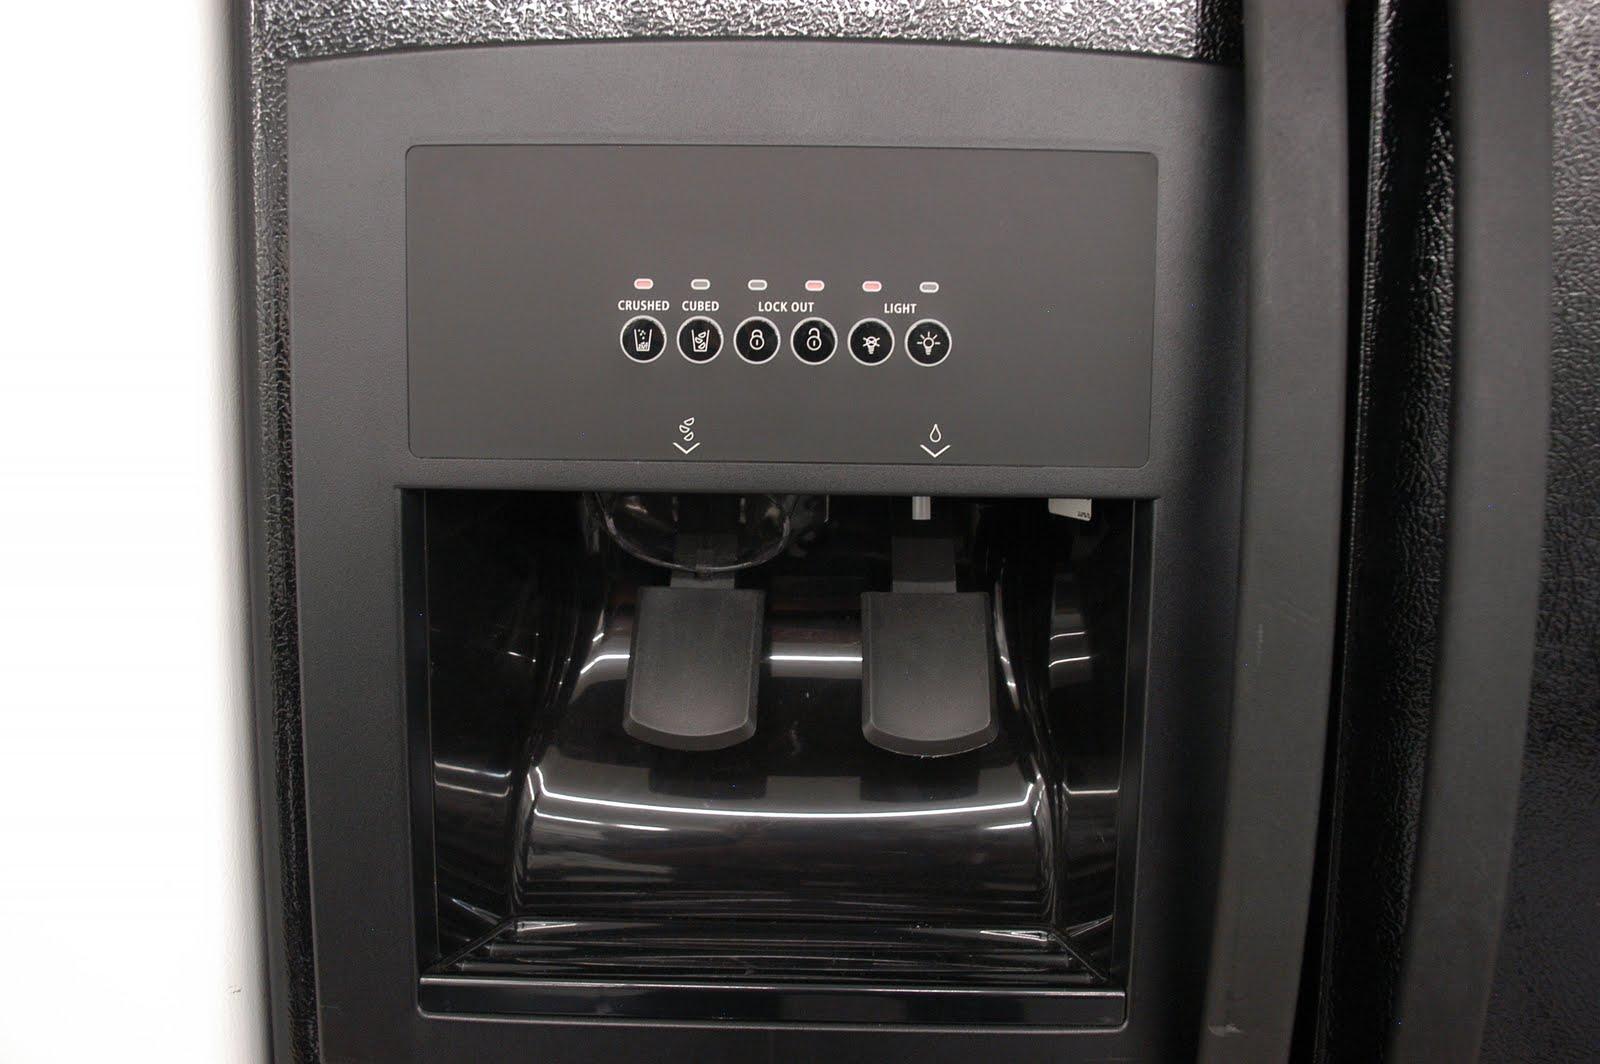 Whirlpool white ice side by side - Whirlpool Black Side By Side Refrigerator Model Ed5kvexvb